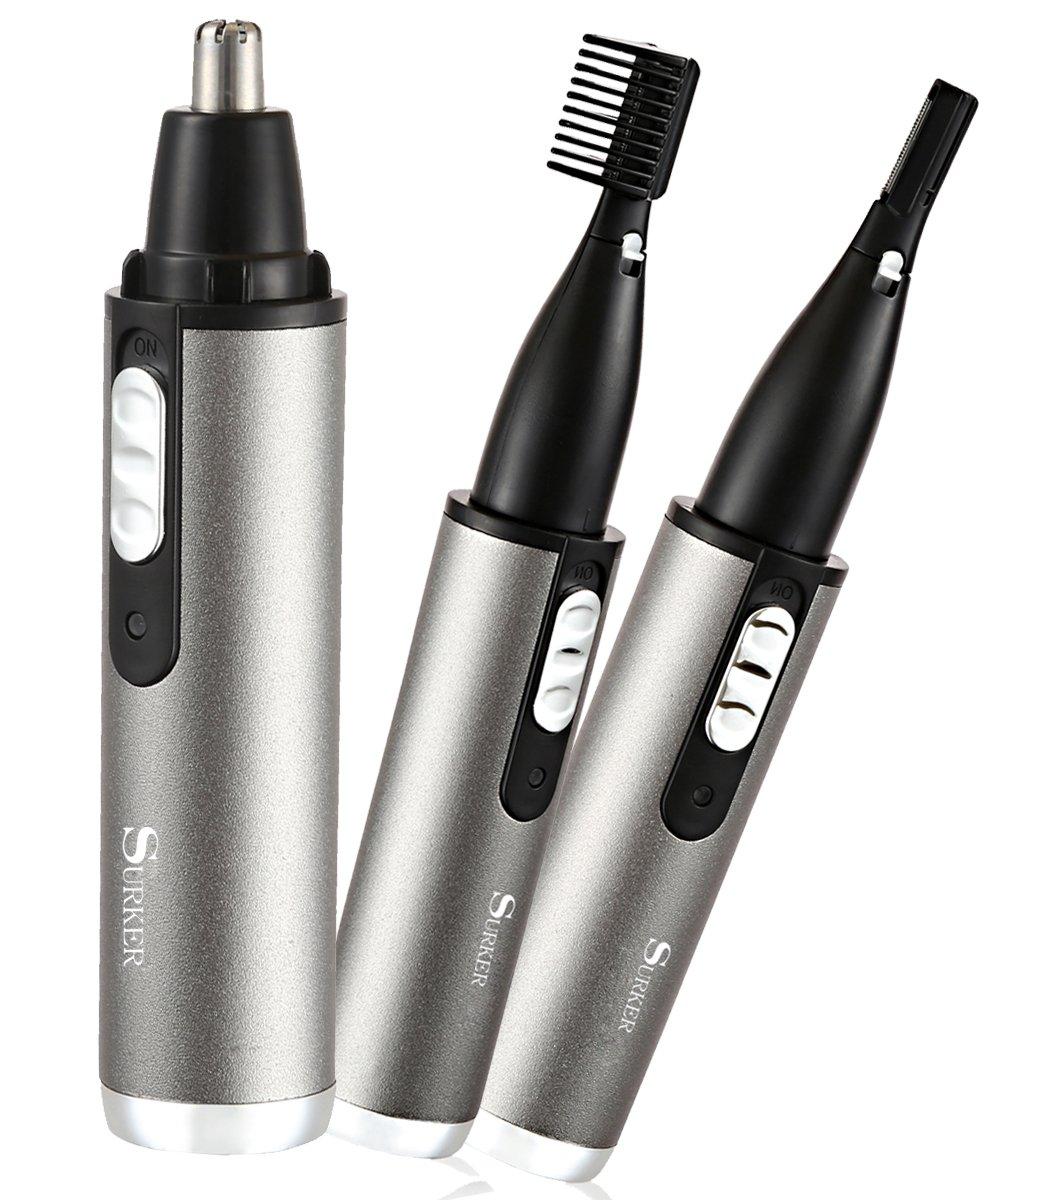 Afeitadora eléctrica batería Ric Peli nariz orejas basette Surker ...